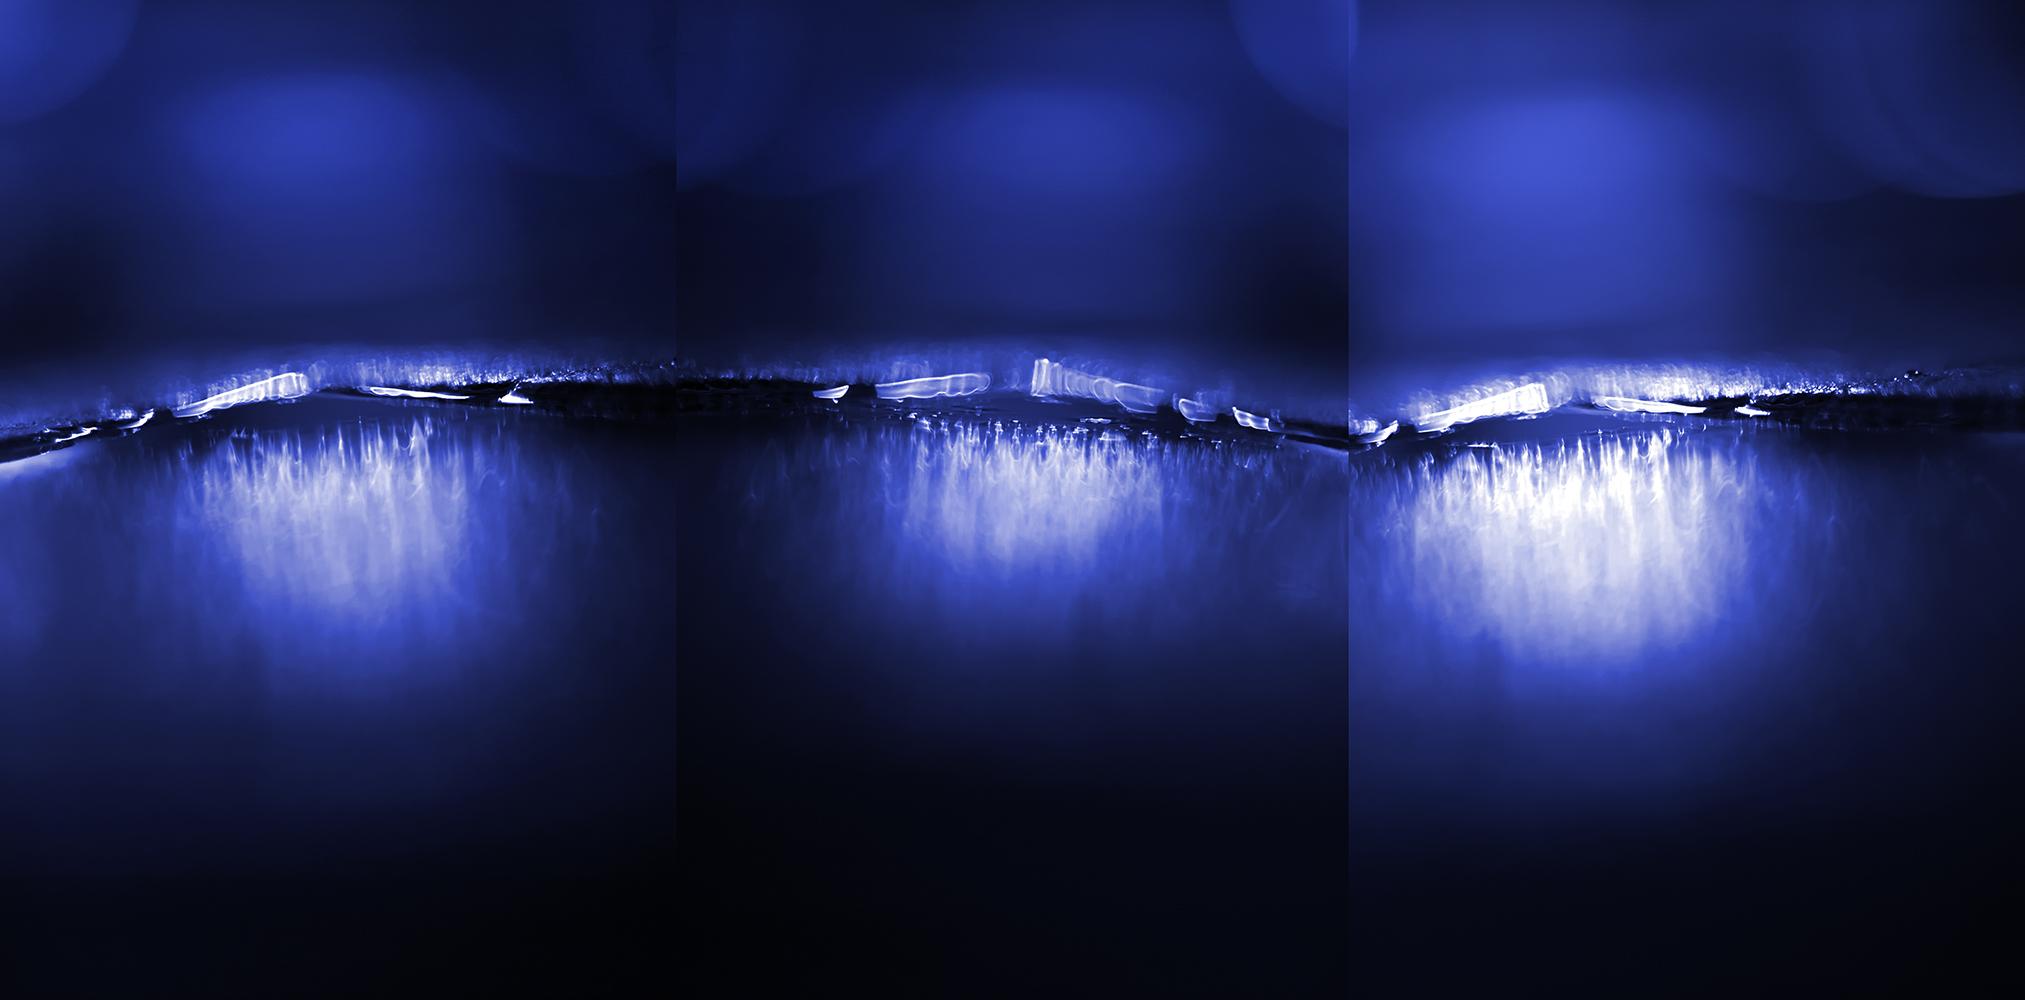 B&W horizon Blue LR.jpg